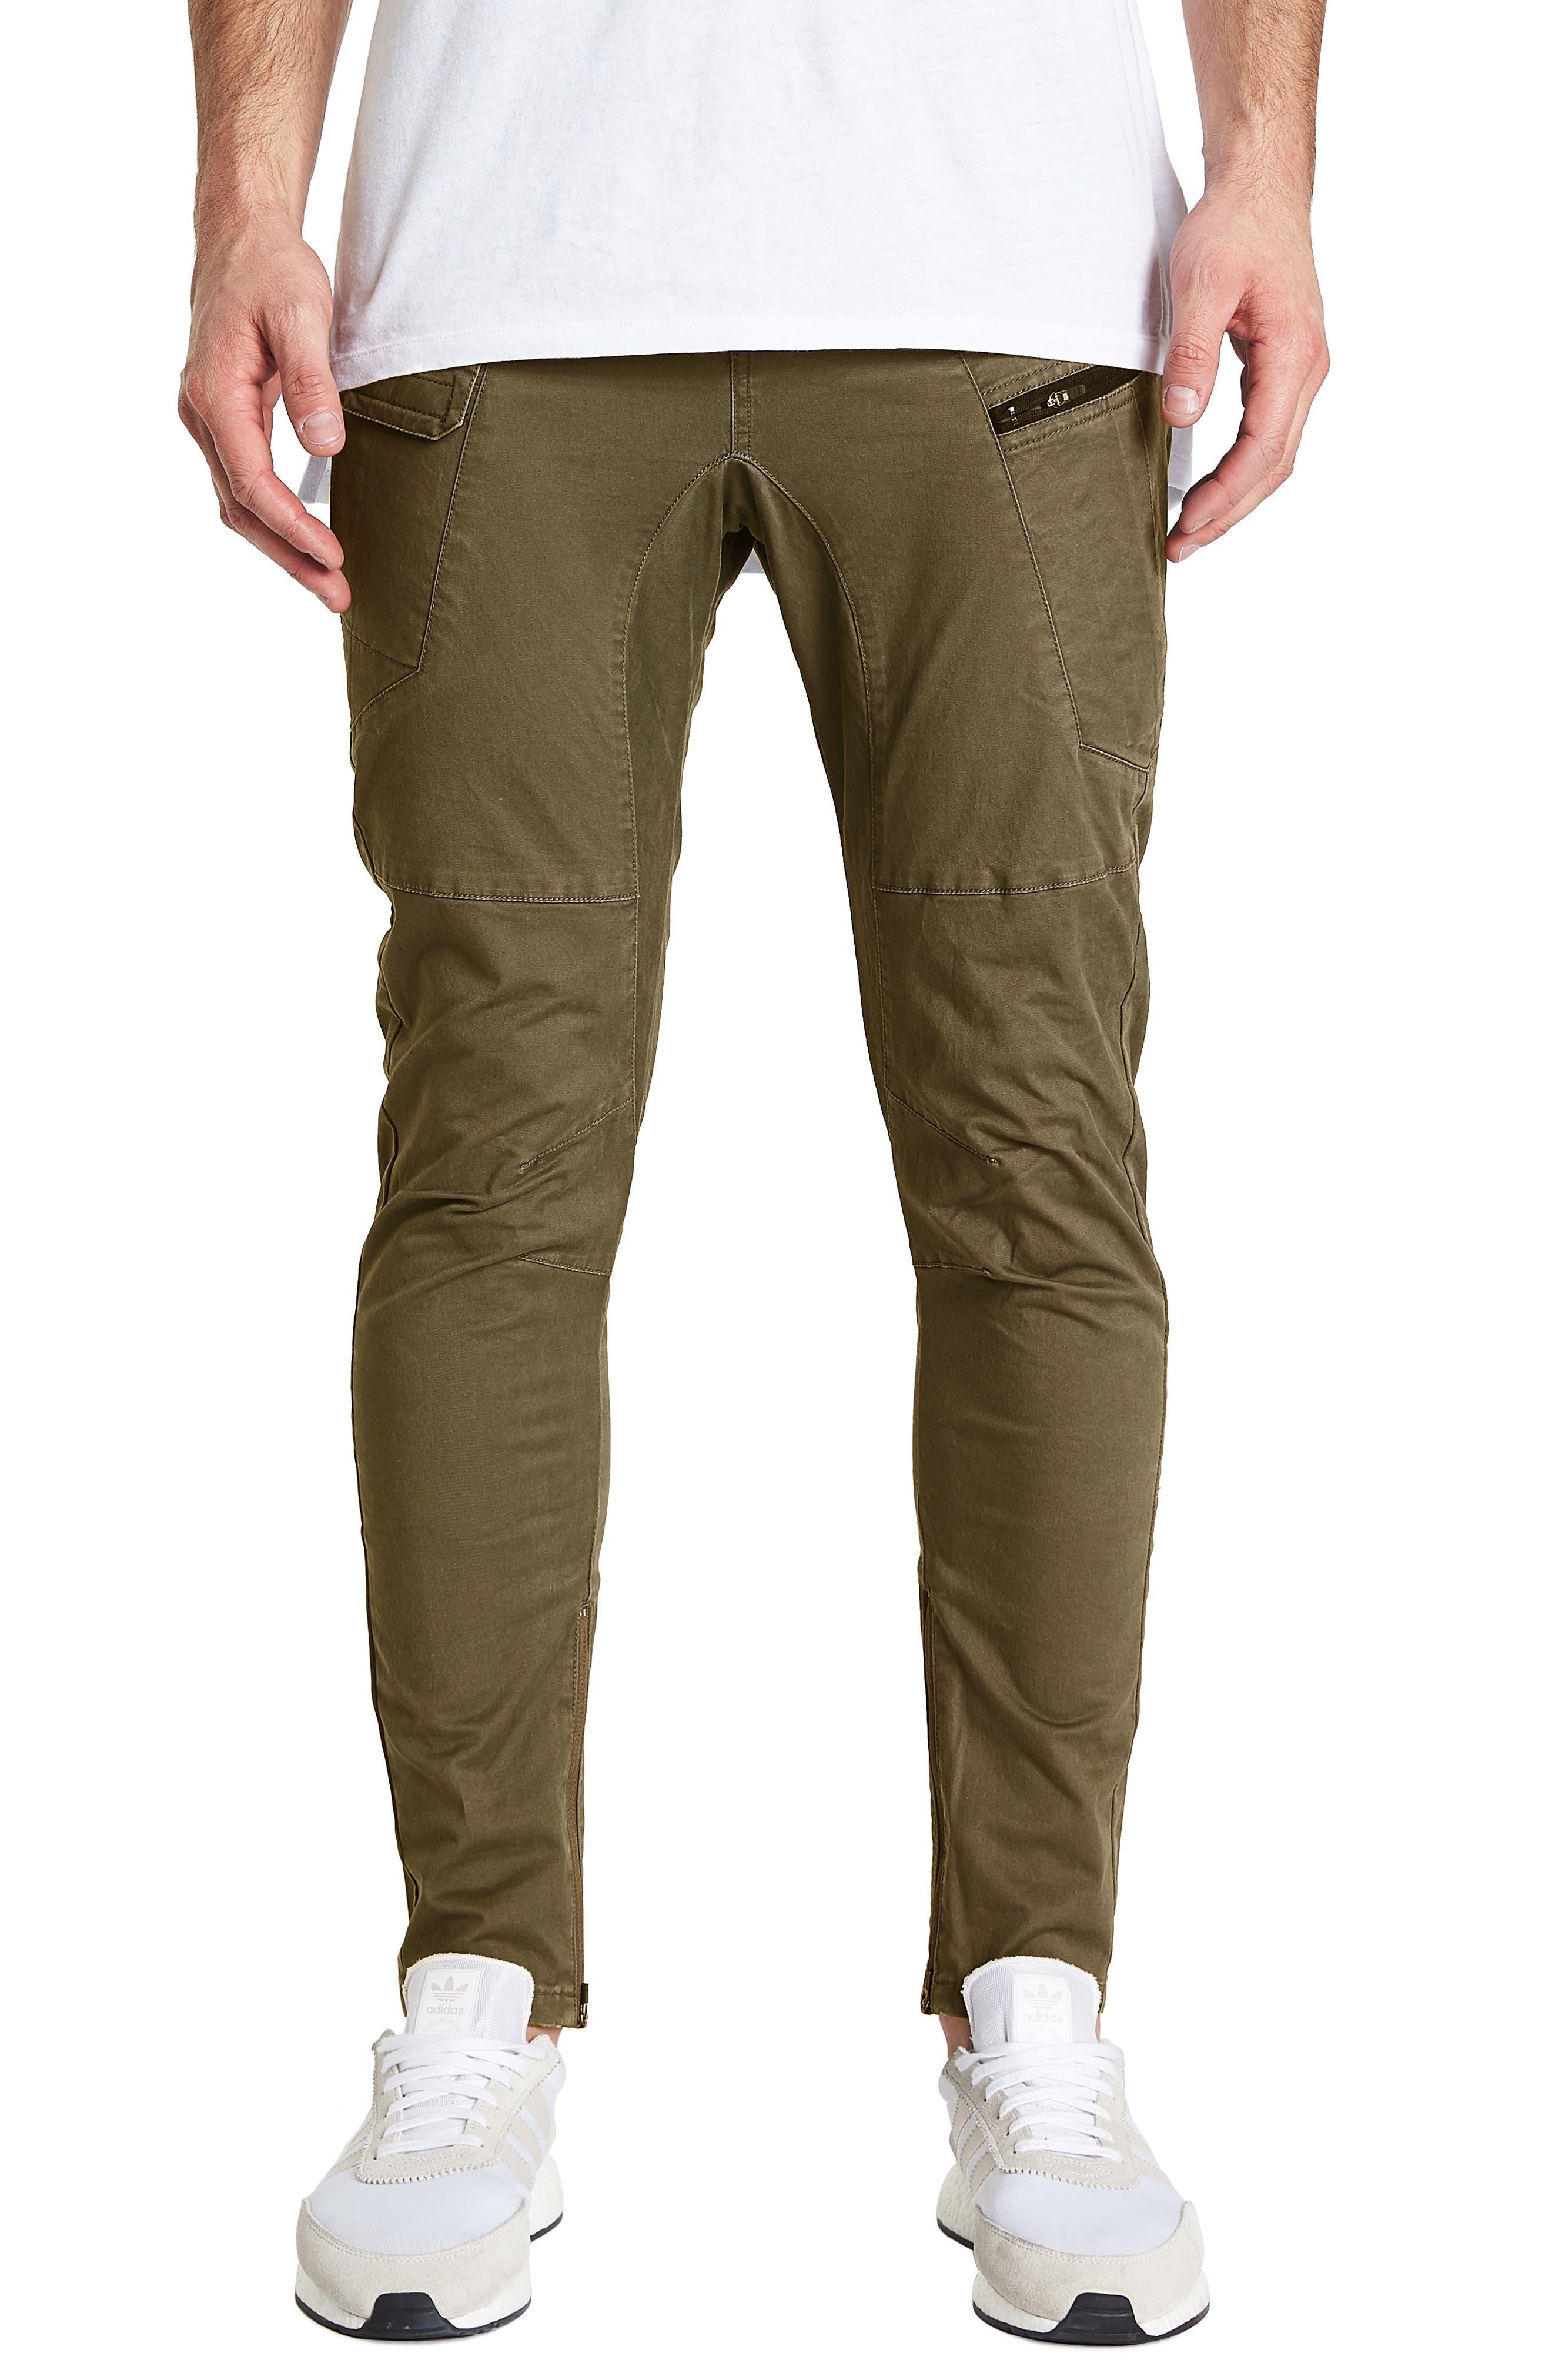 Tactical Slim Fit Pants,                             Main thumbnail 1, color,                             IVY GREEN